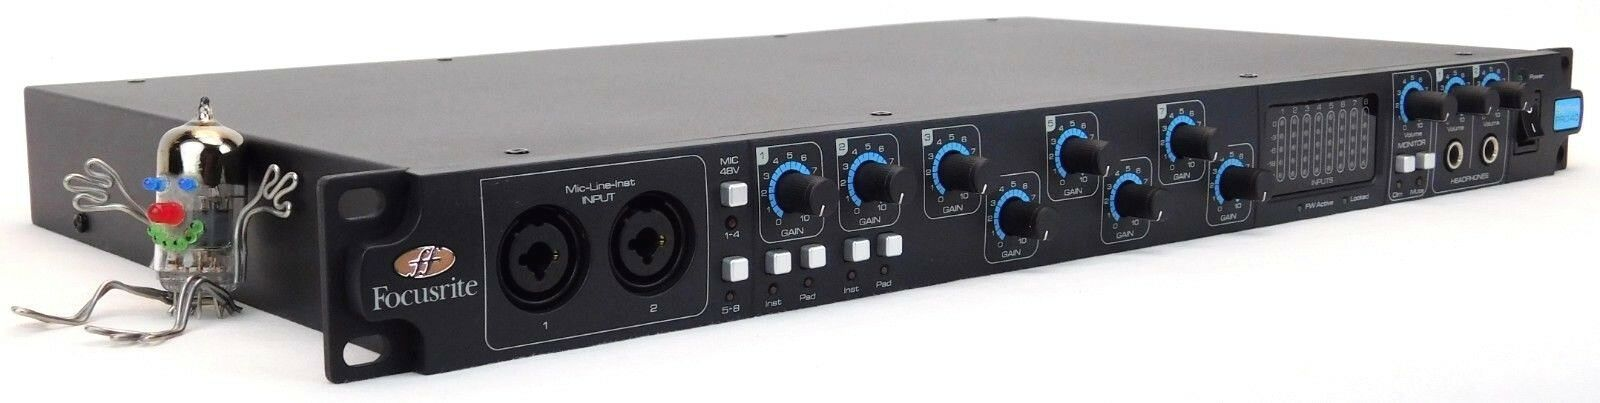 Focusrite Saffire PRO 40 Firewire Audio Interface +Fast Neuwertig+ 1.5J 1.5J 1.5J Garantie 376bc2